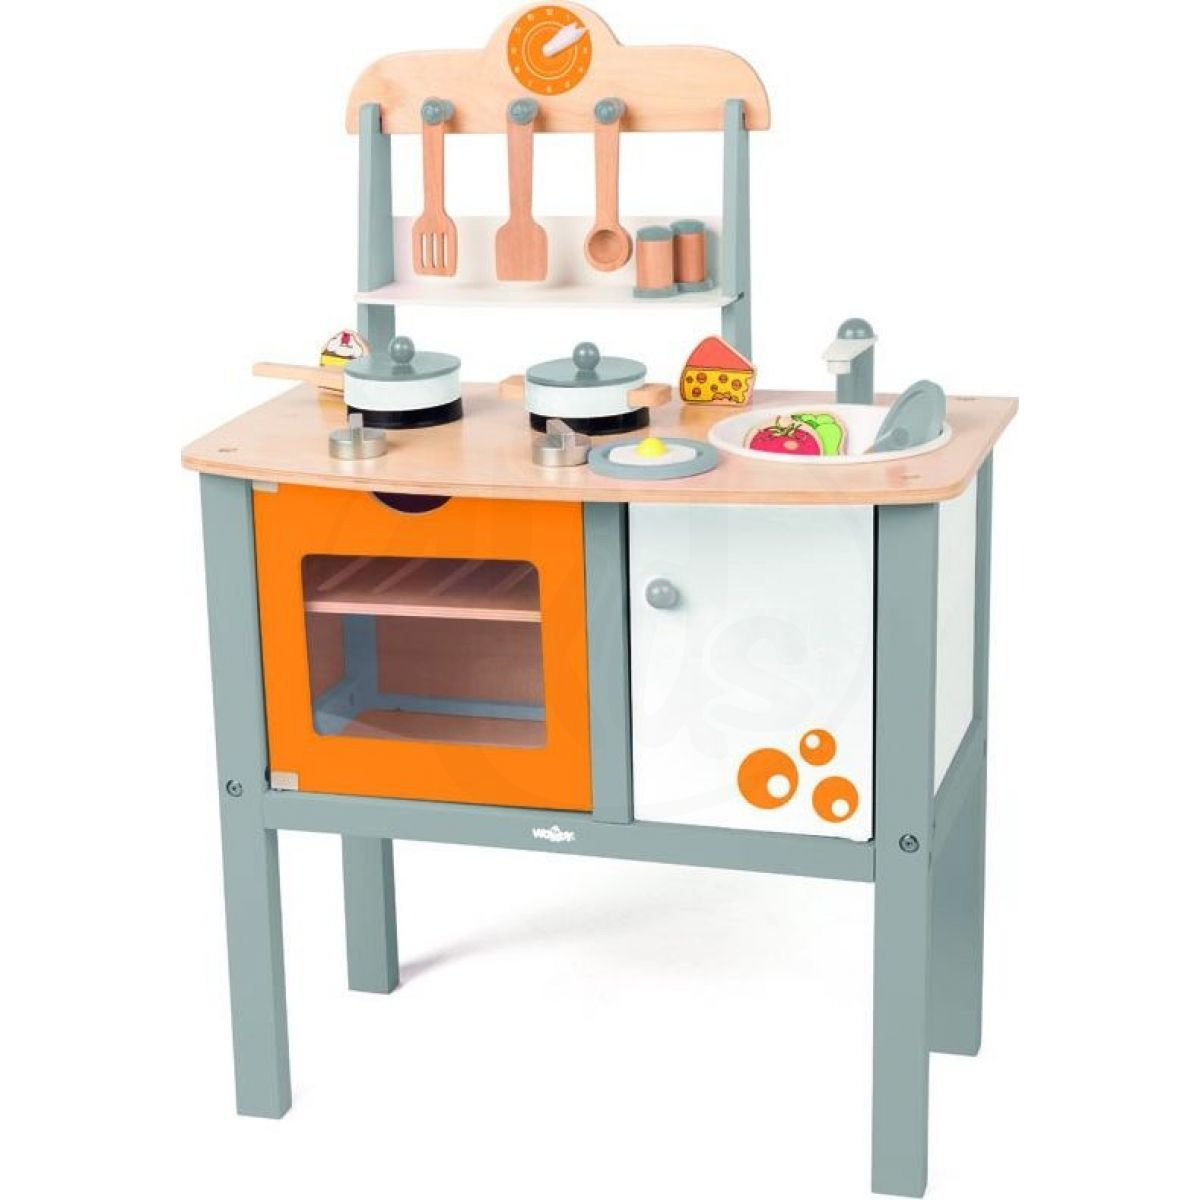 Woody Kuchyňka malá Buona Cucina